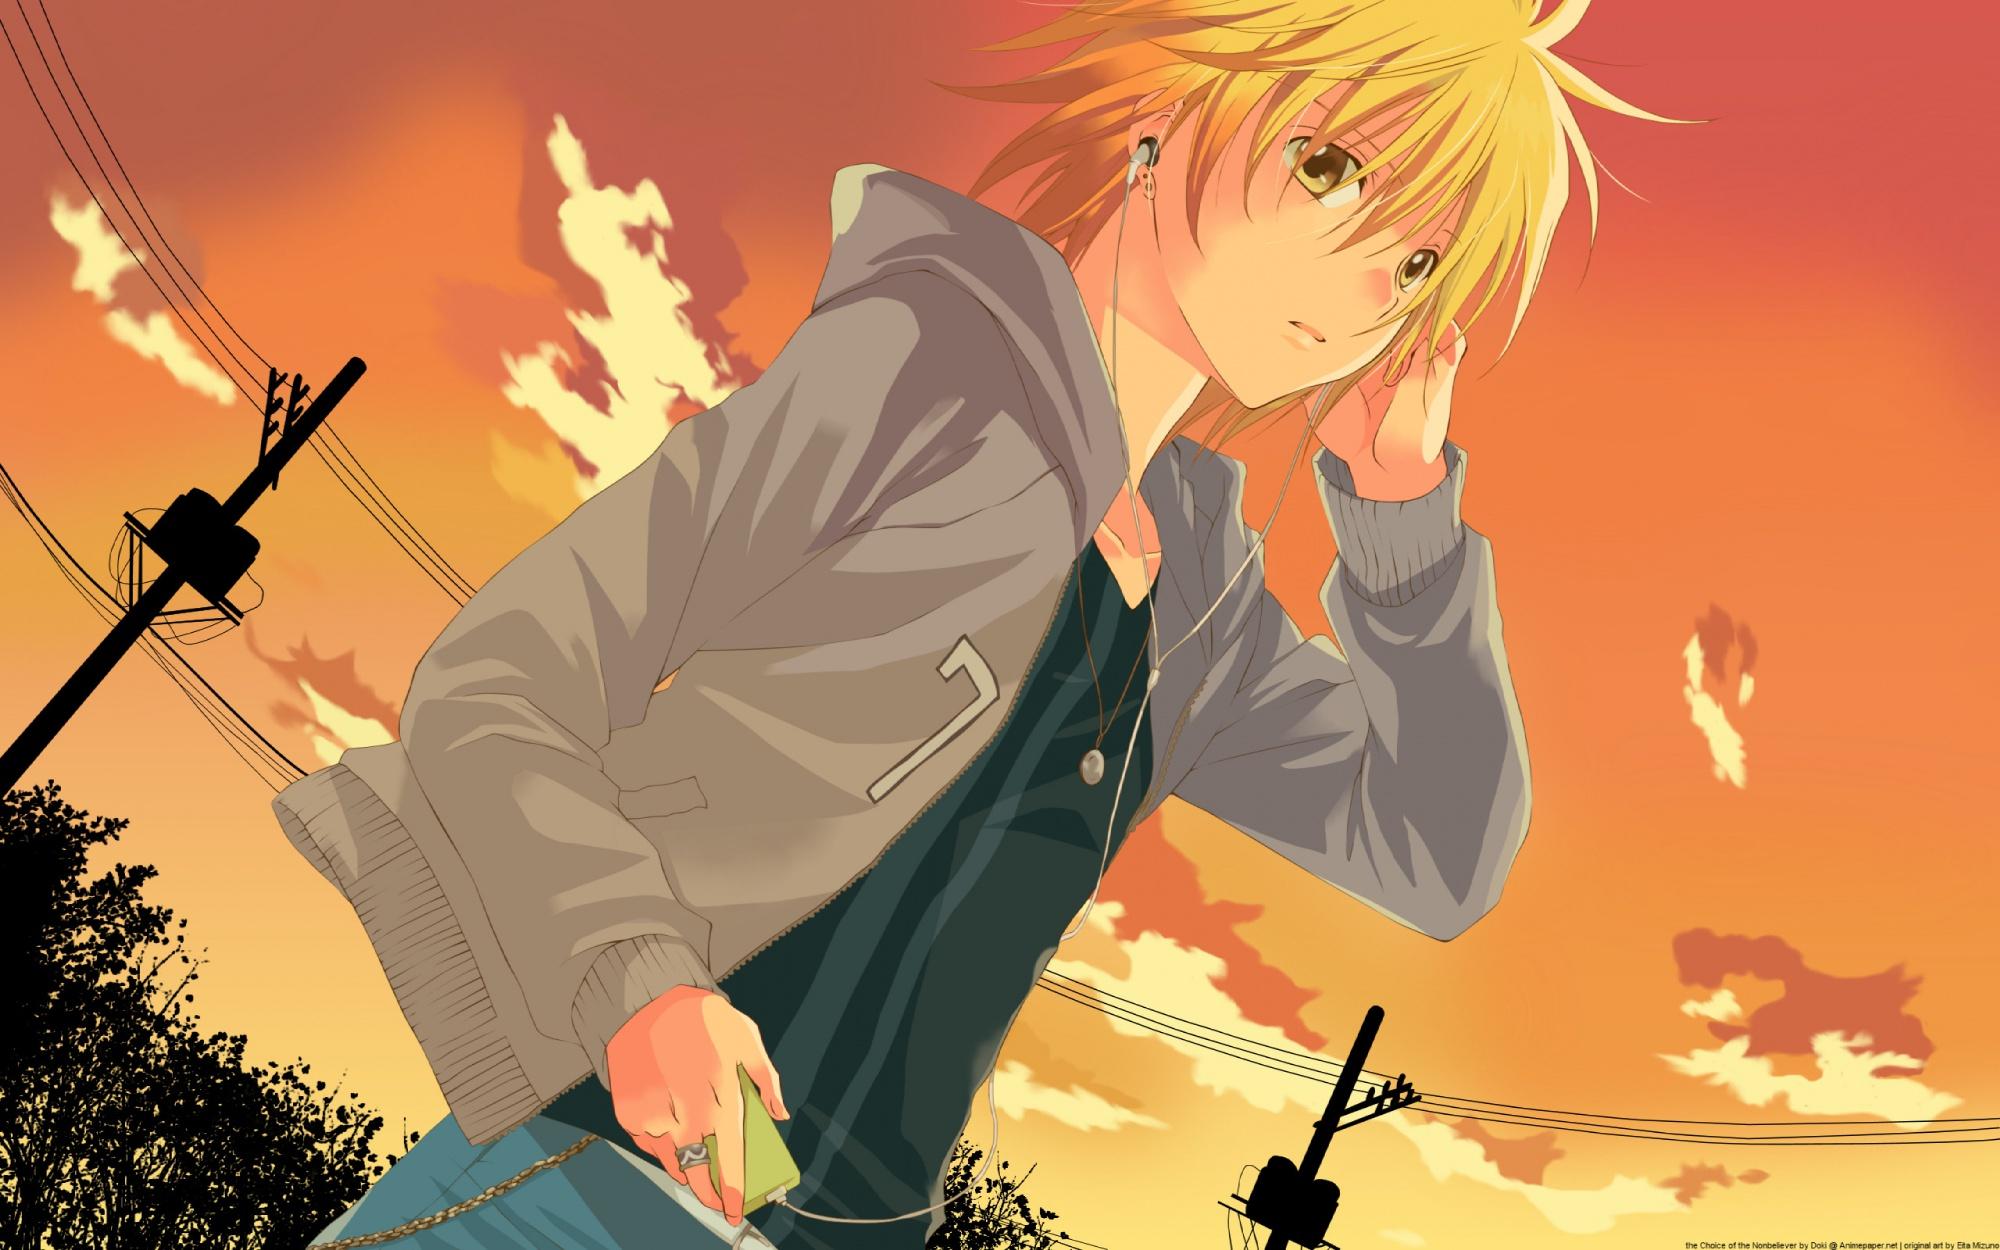 blonde_hair headphones ipod orange sawamura_shirou scenic short_hair sky spiral sunset